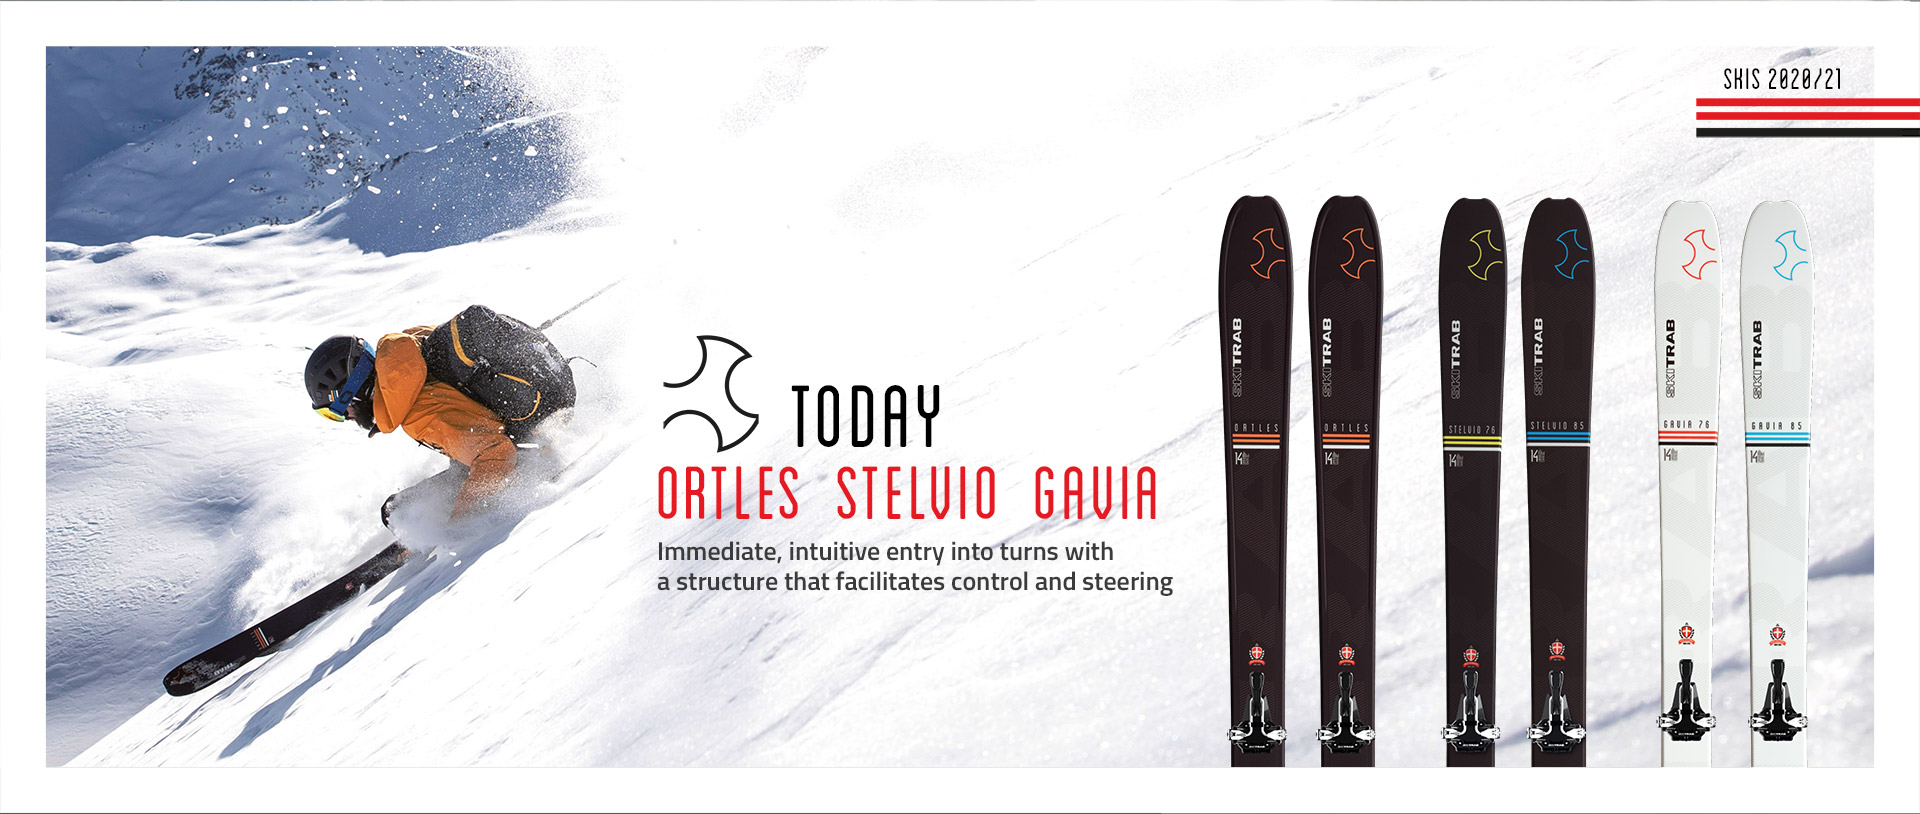 Ortles-Stelvio-Gavia_Collection_com